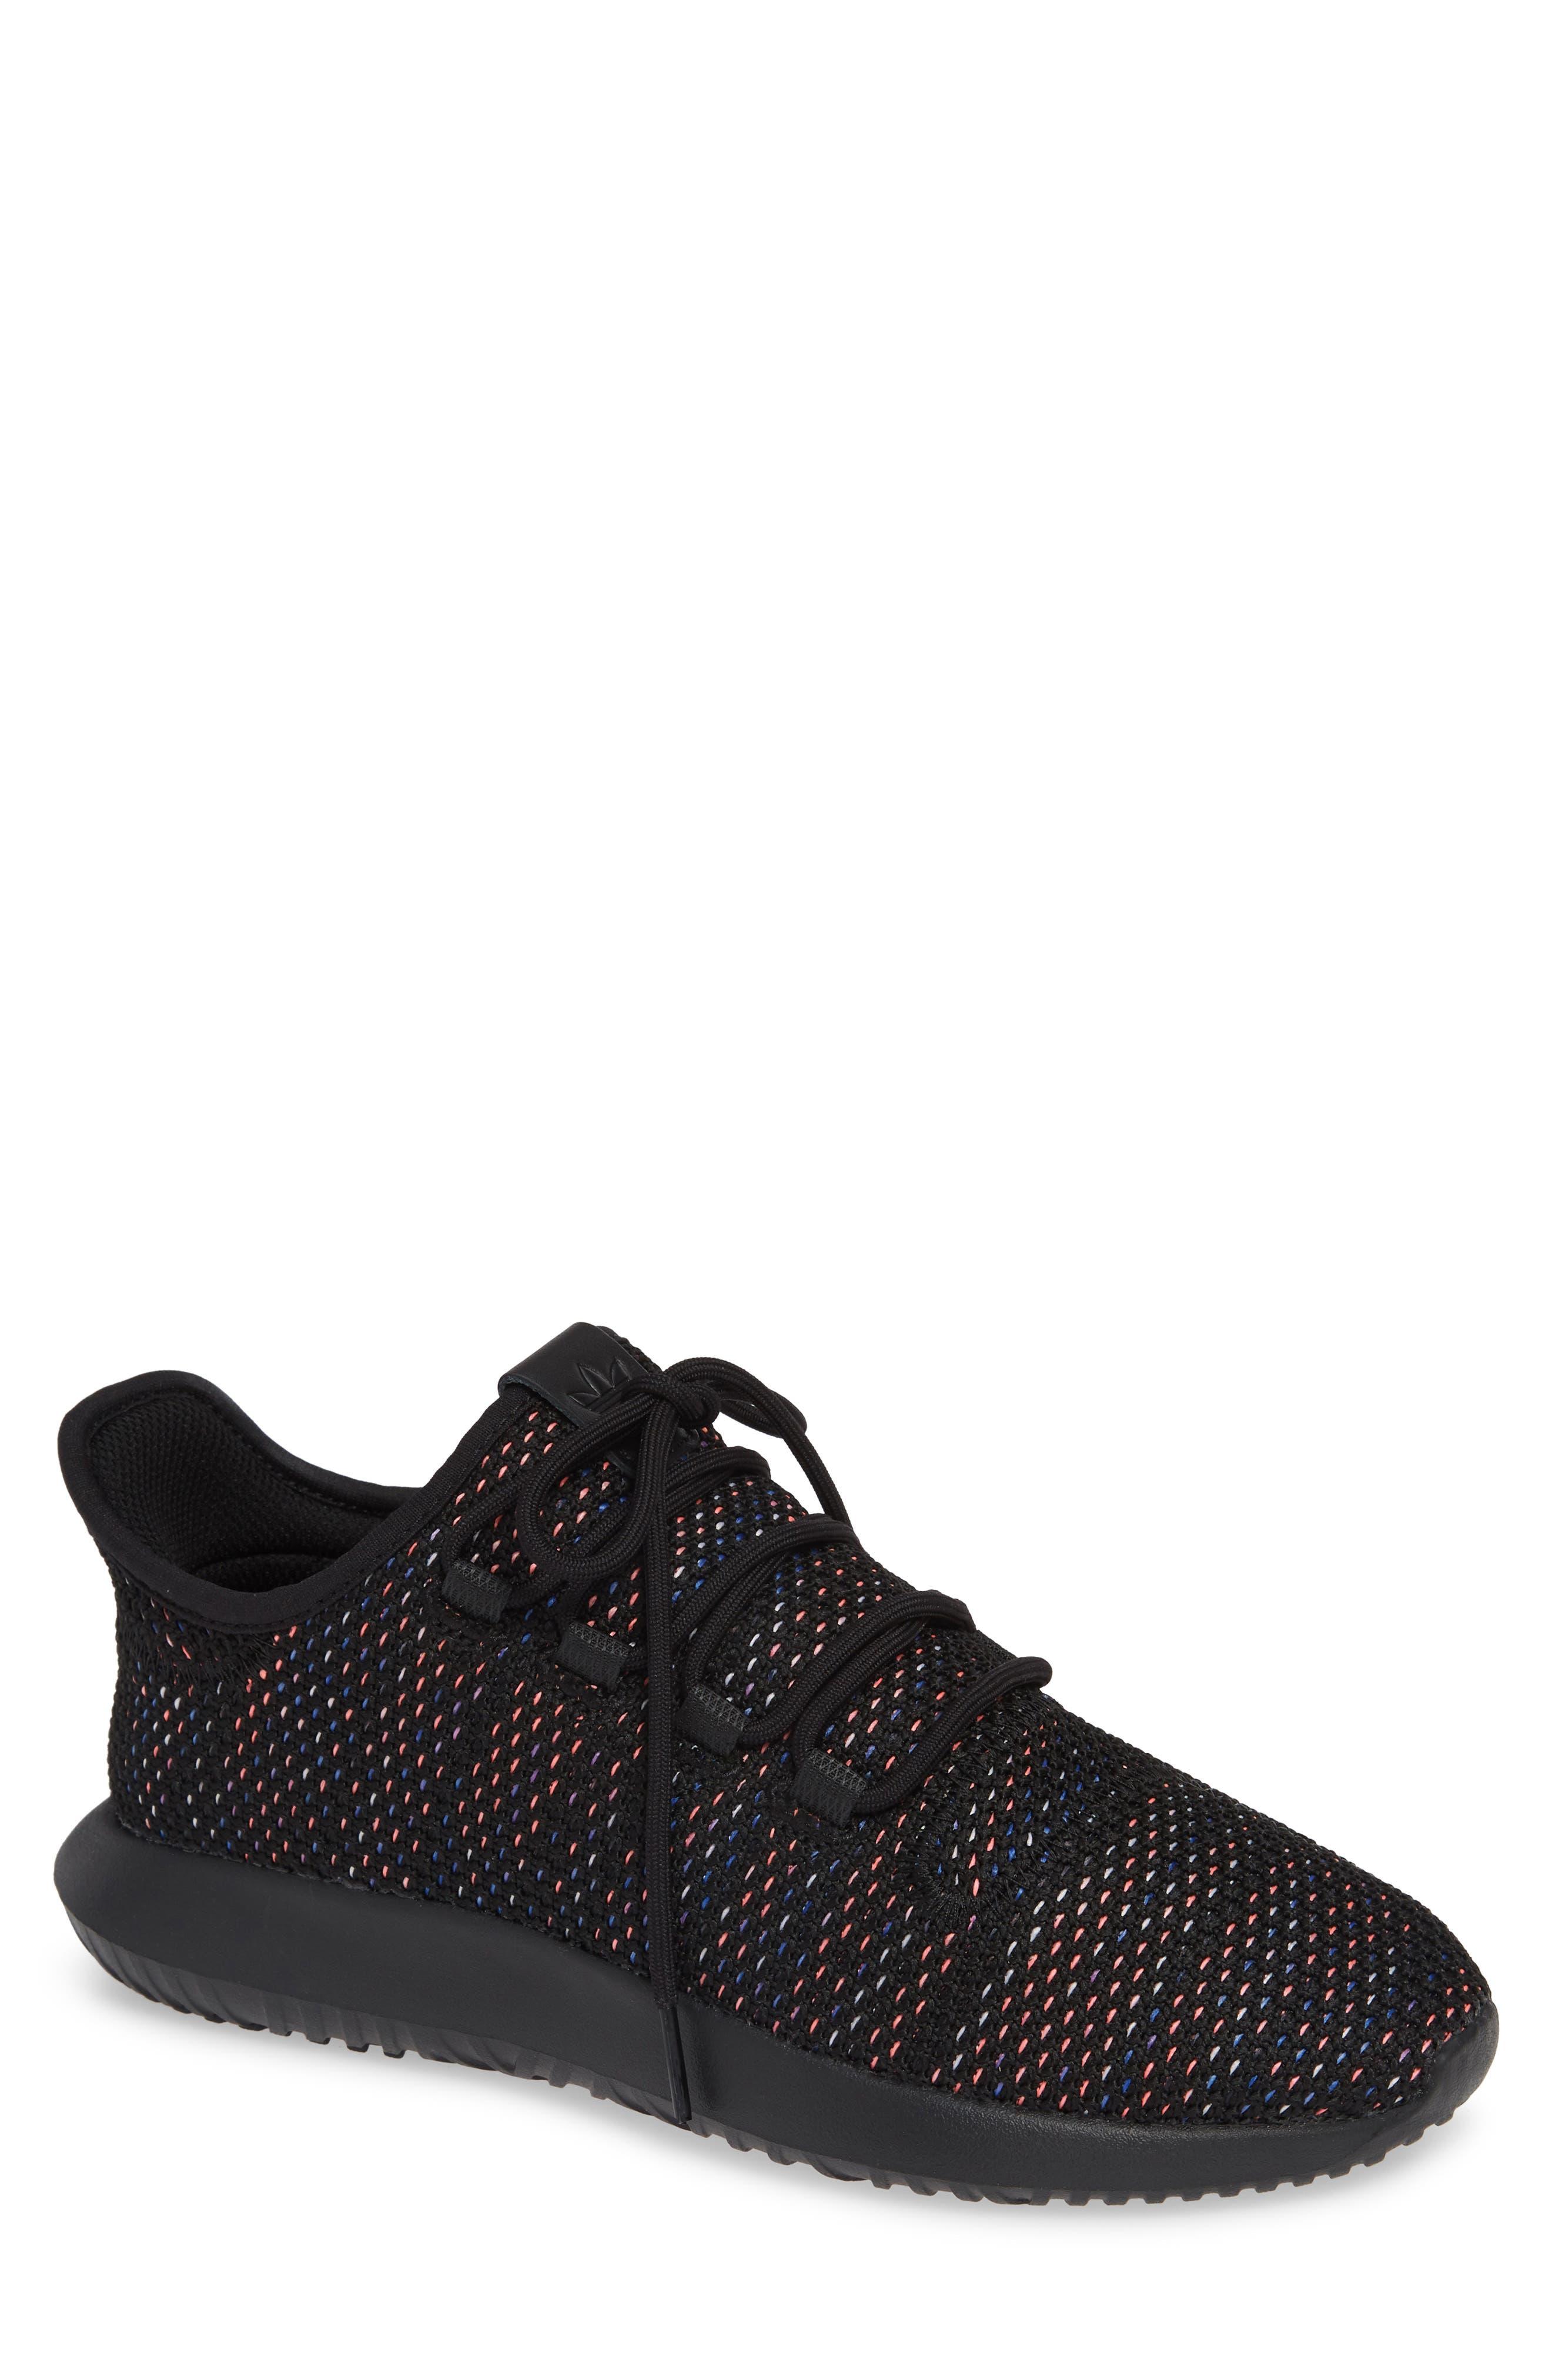 Tubular Shadow CK Sneaker,                         Main,                         color, BLACK/ SOLAR RED/ MYSTERY INK